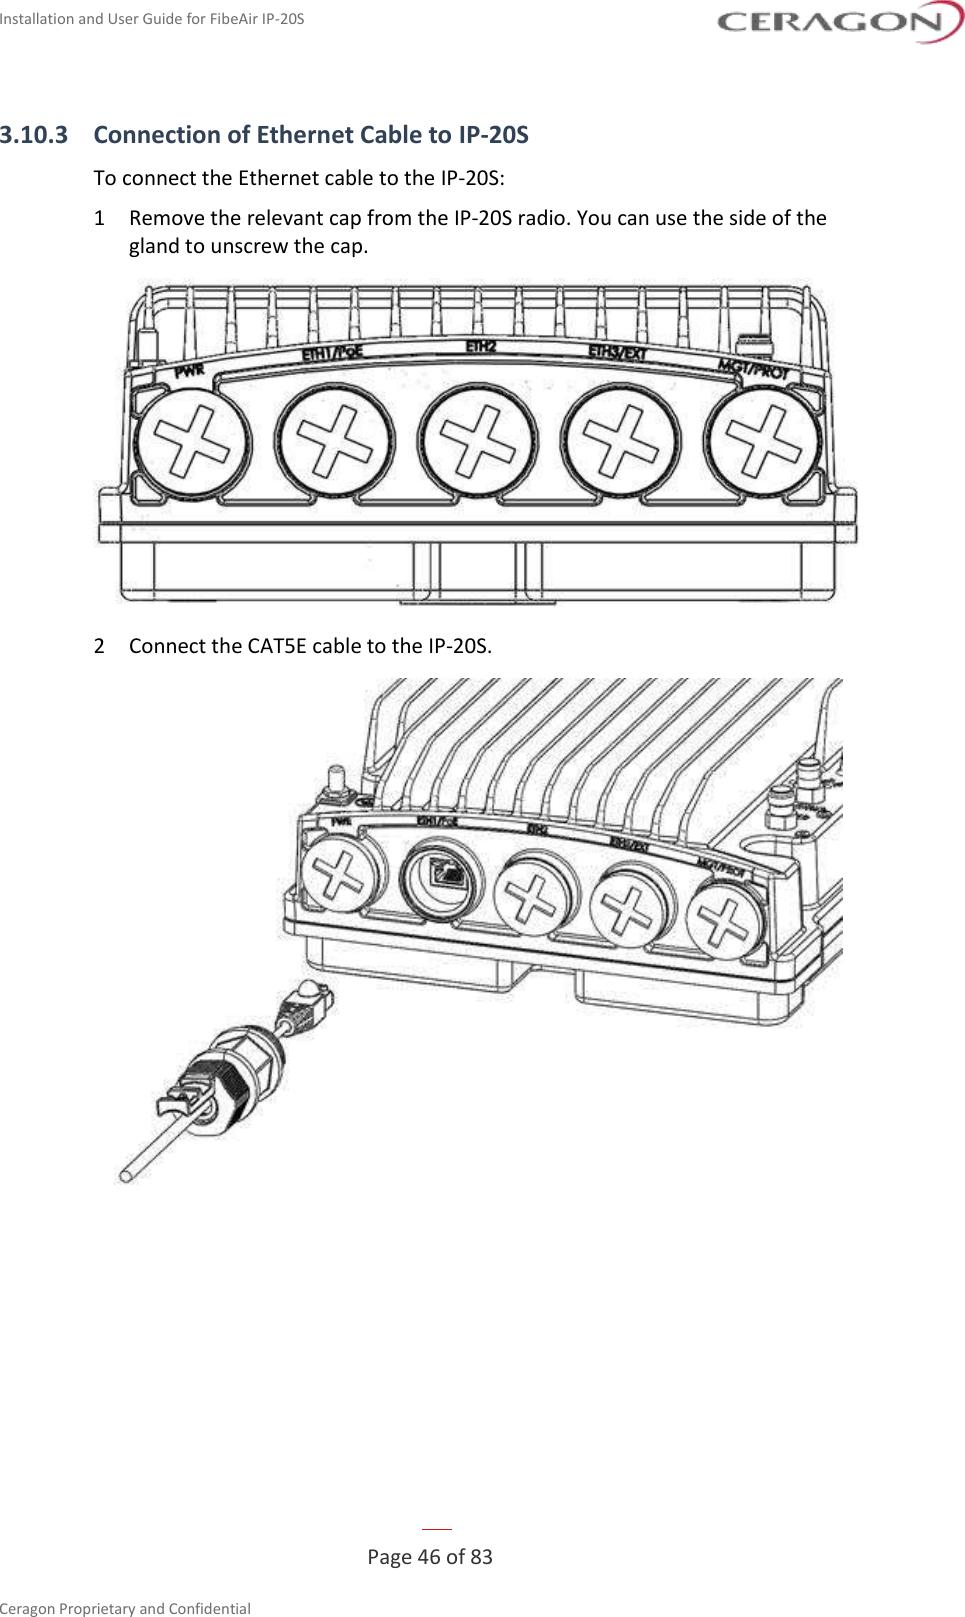 Download Ceragon FibeAir IP-20G Technical Description